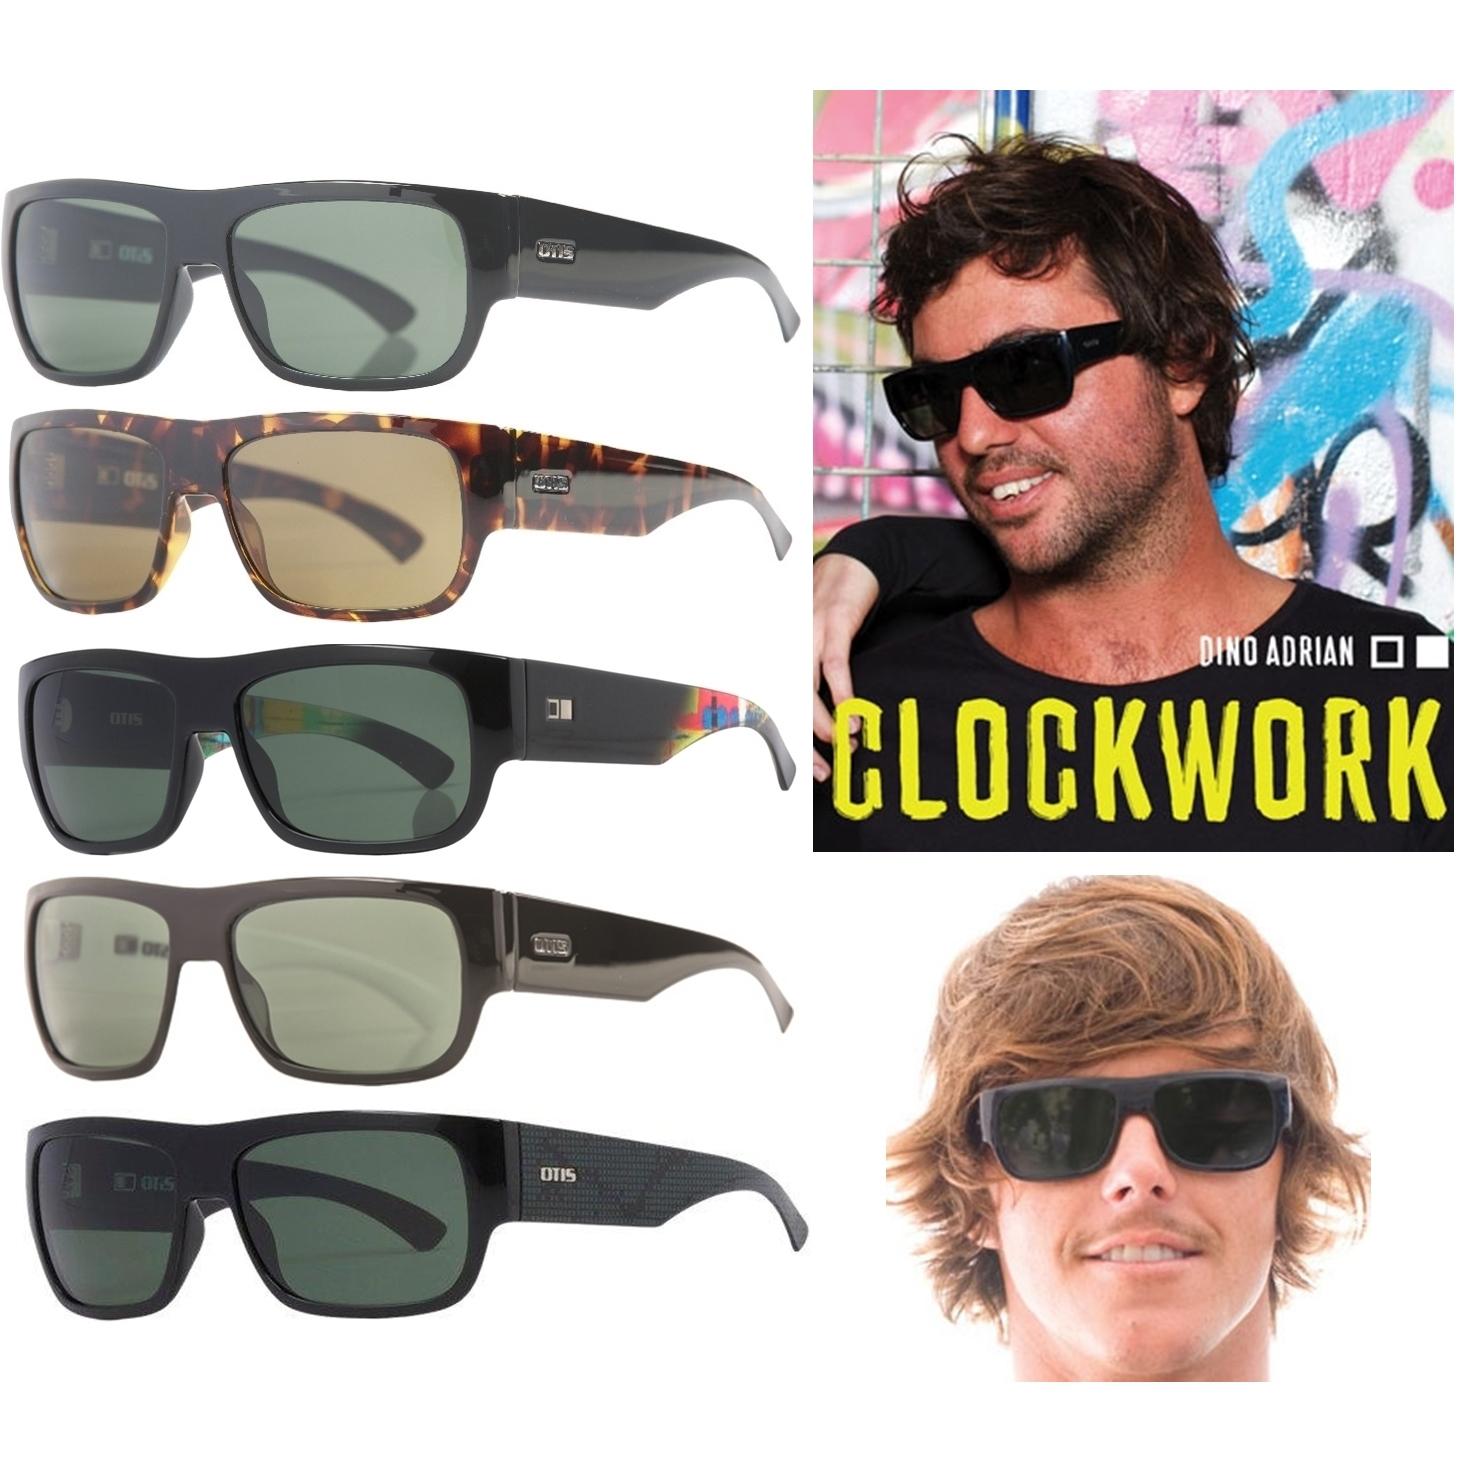 Details about NEW Otis Clockwork Mineral Glass Lens Mens Rectangular  Sunglasses Msrp 160 2a93ad75f